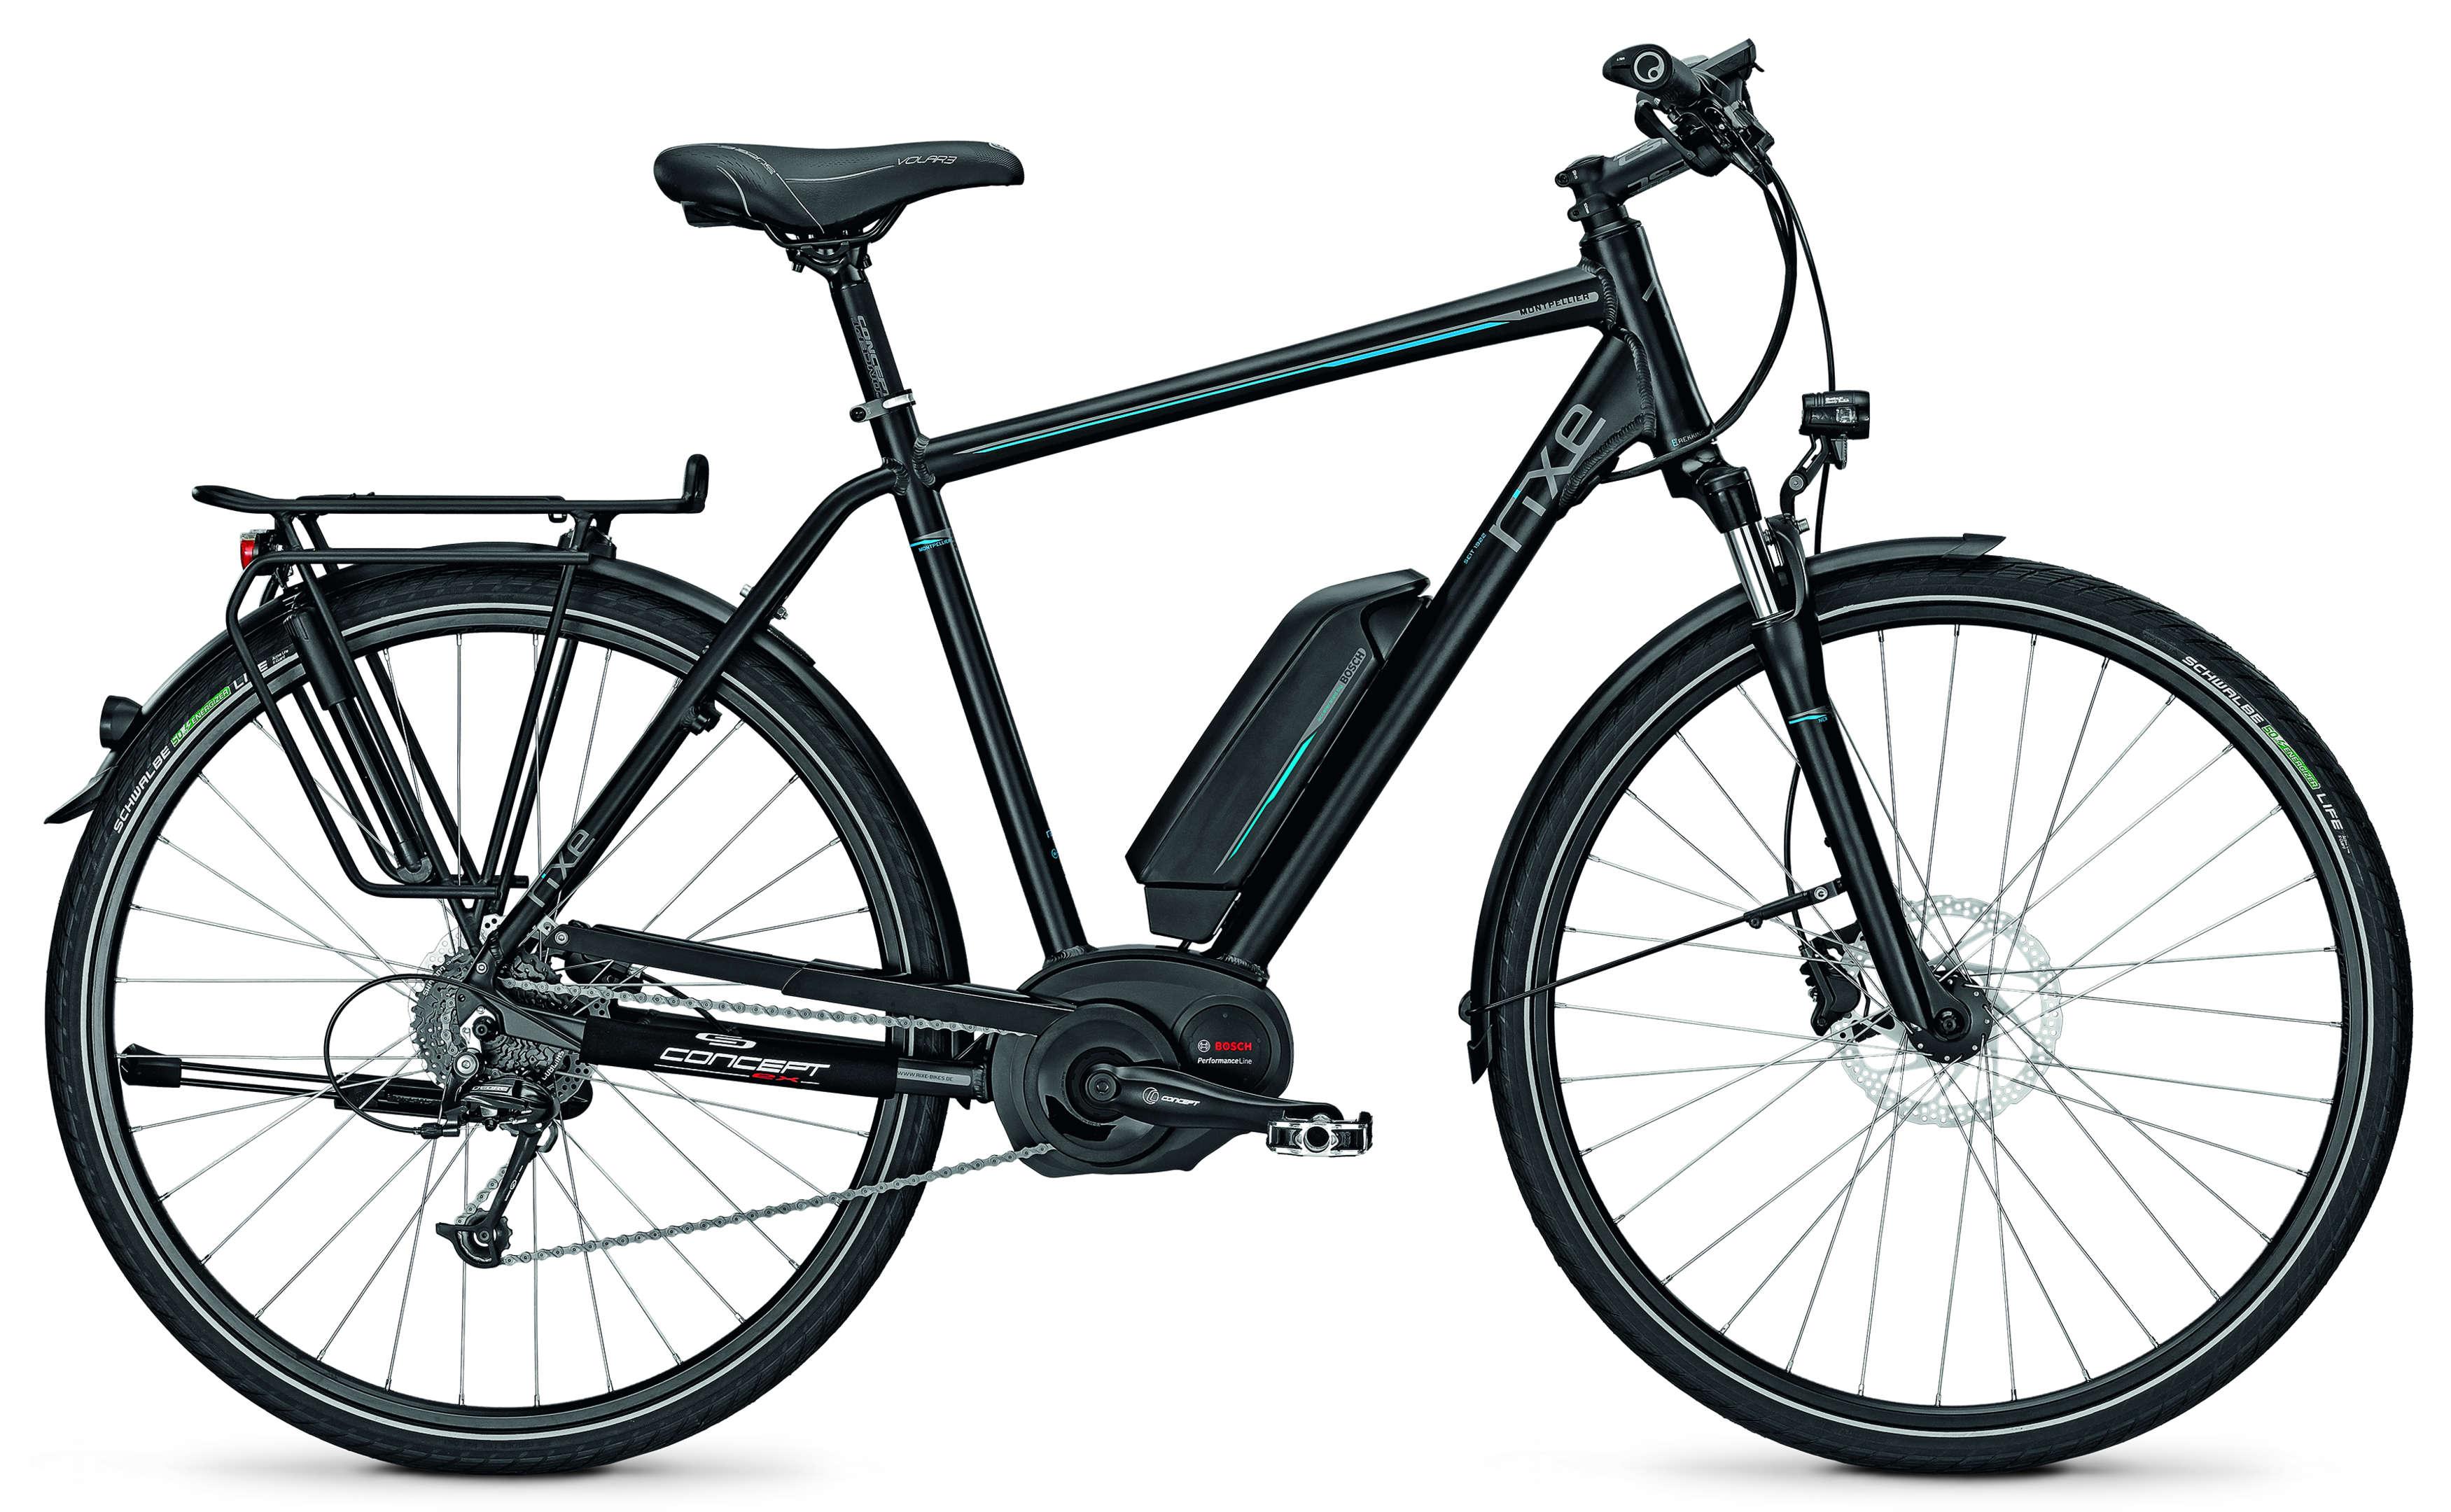 rixe e bike montpellier b9 eurorad bikeleasingeurorad. Black Bedroom Furniture Sets. Home Design Ideas